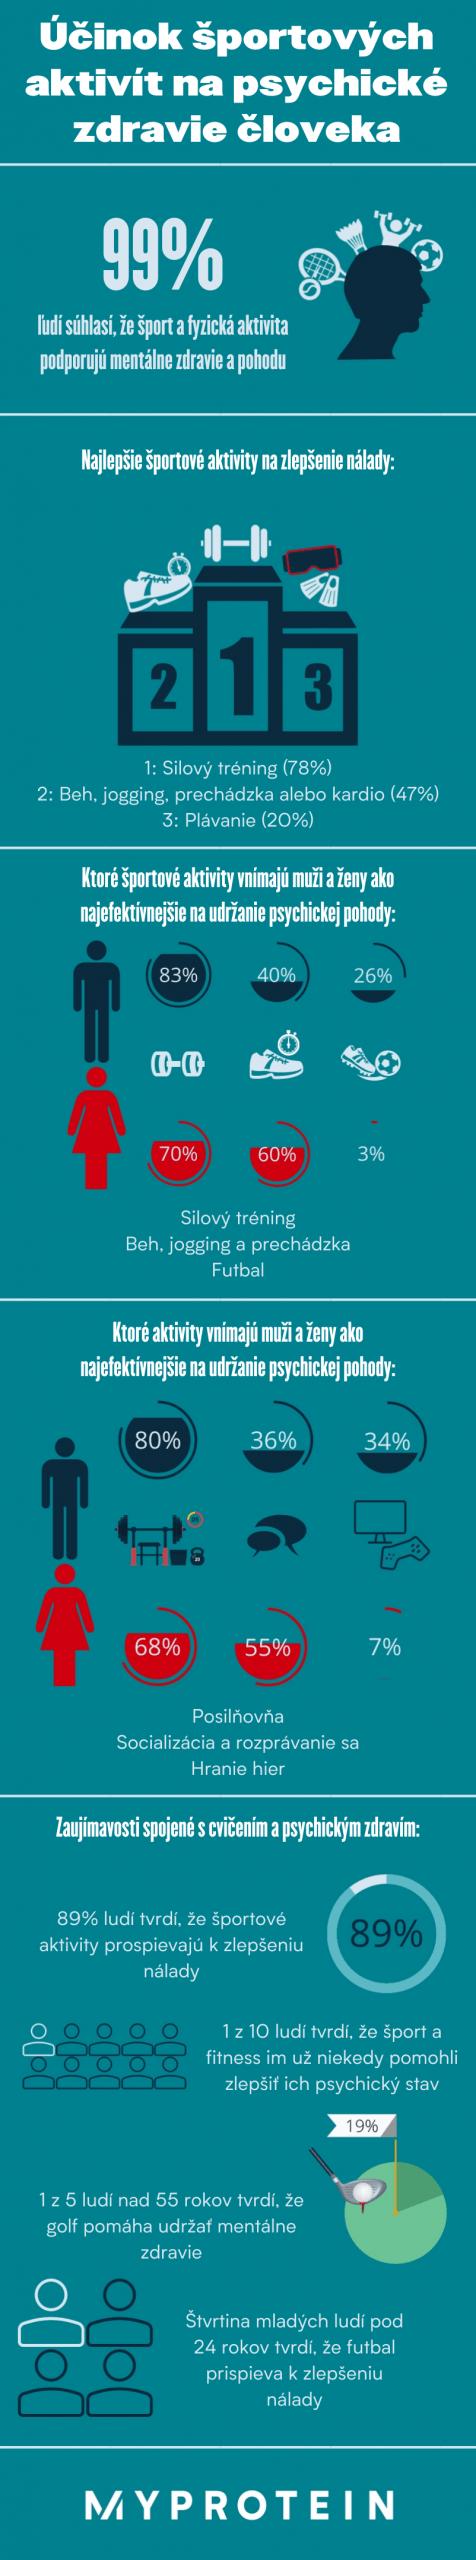 grafika - vyplyv športovania na psychiku